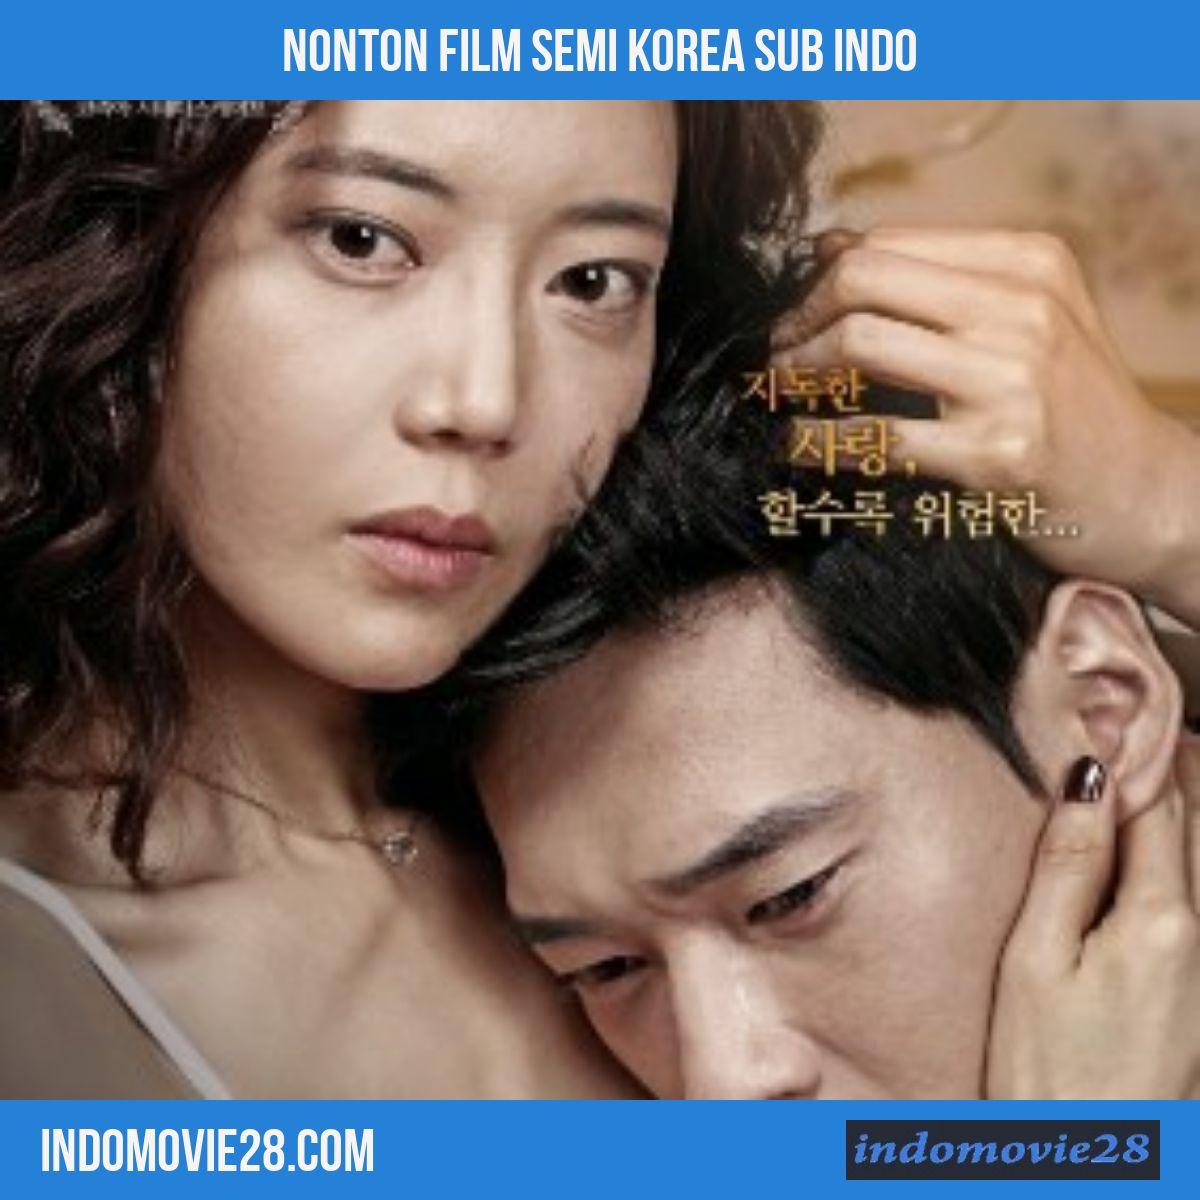 Nonton Film Nonton Film Purpose of Reunion (2015) Film Semi | Chrono88